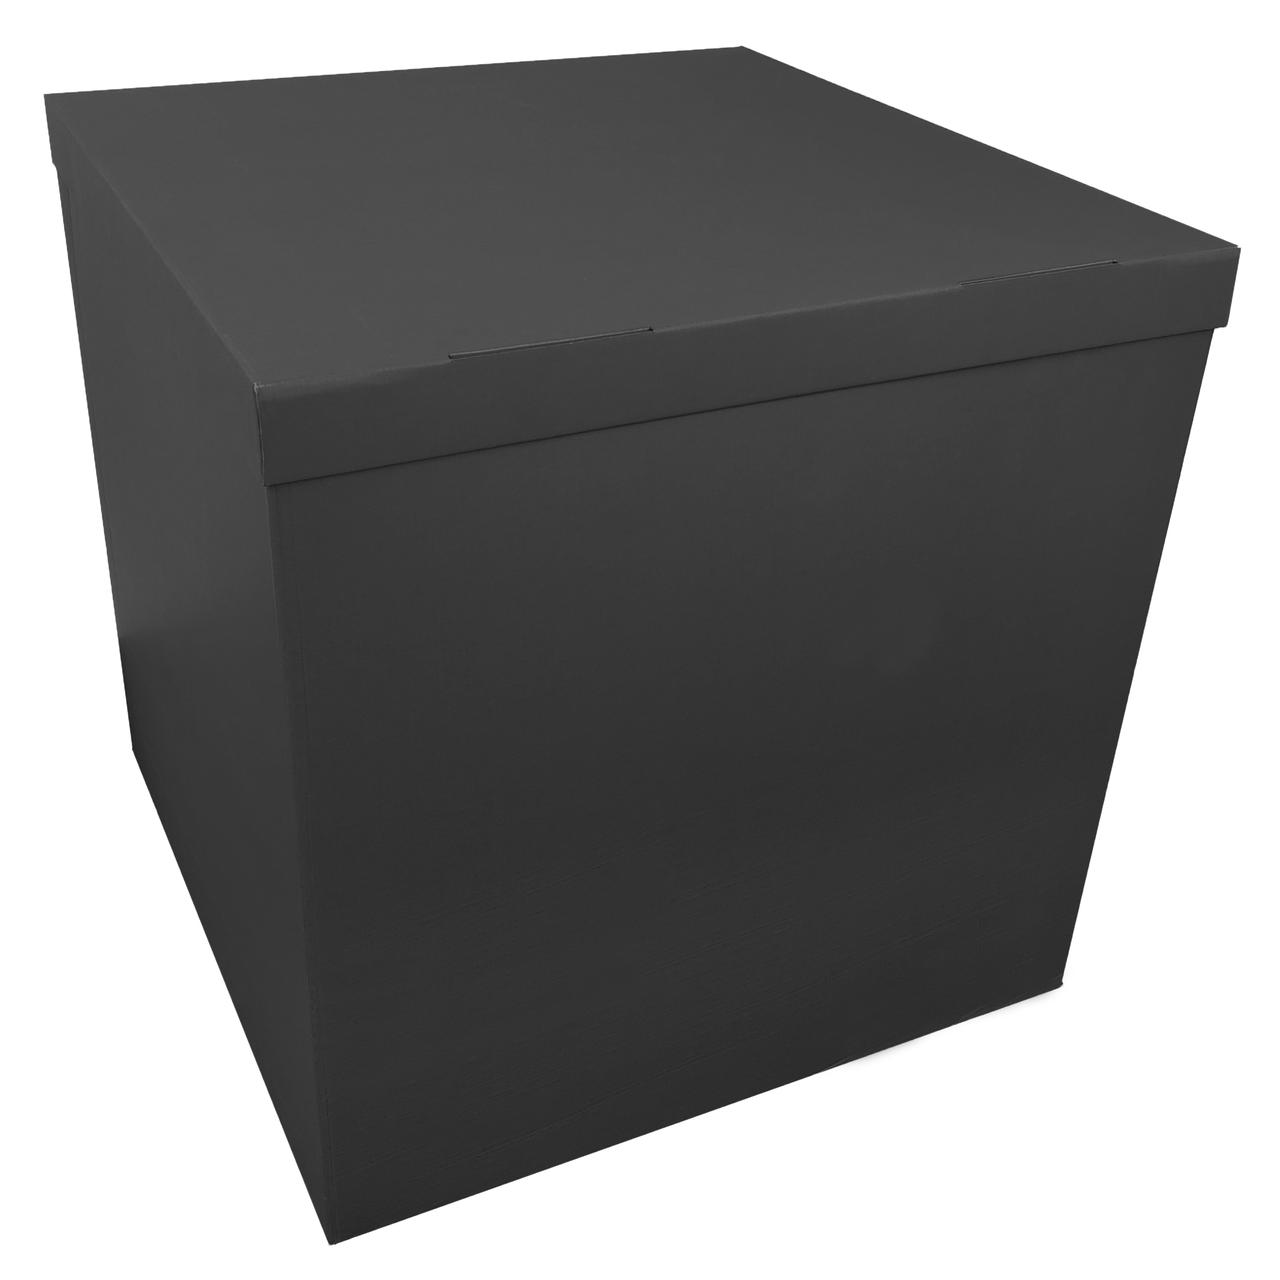 Коробка-сюрприз 70*70*70см двухсторонняя черная, 1 шт